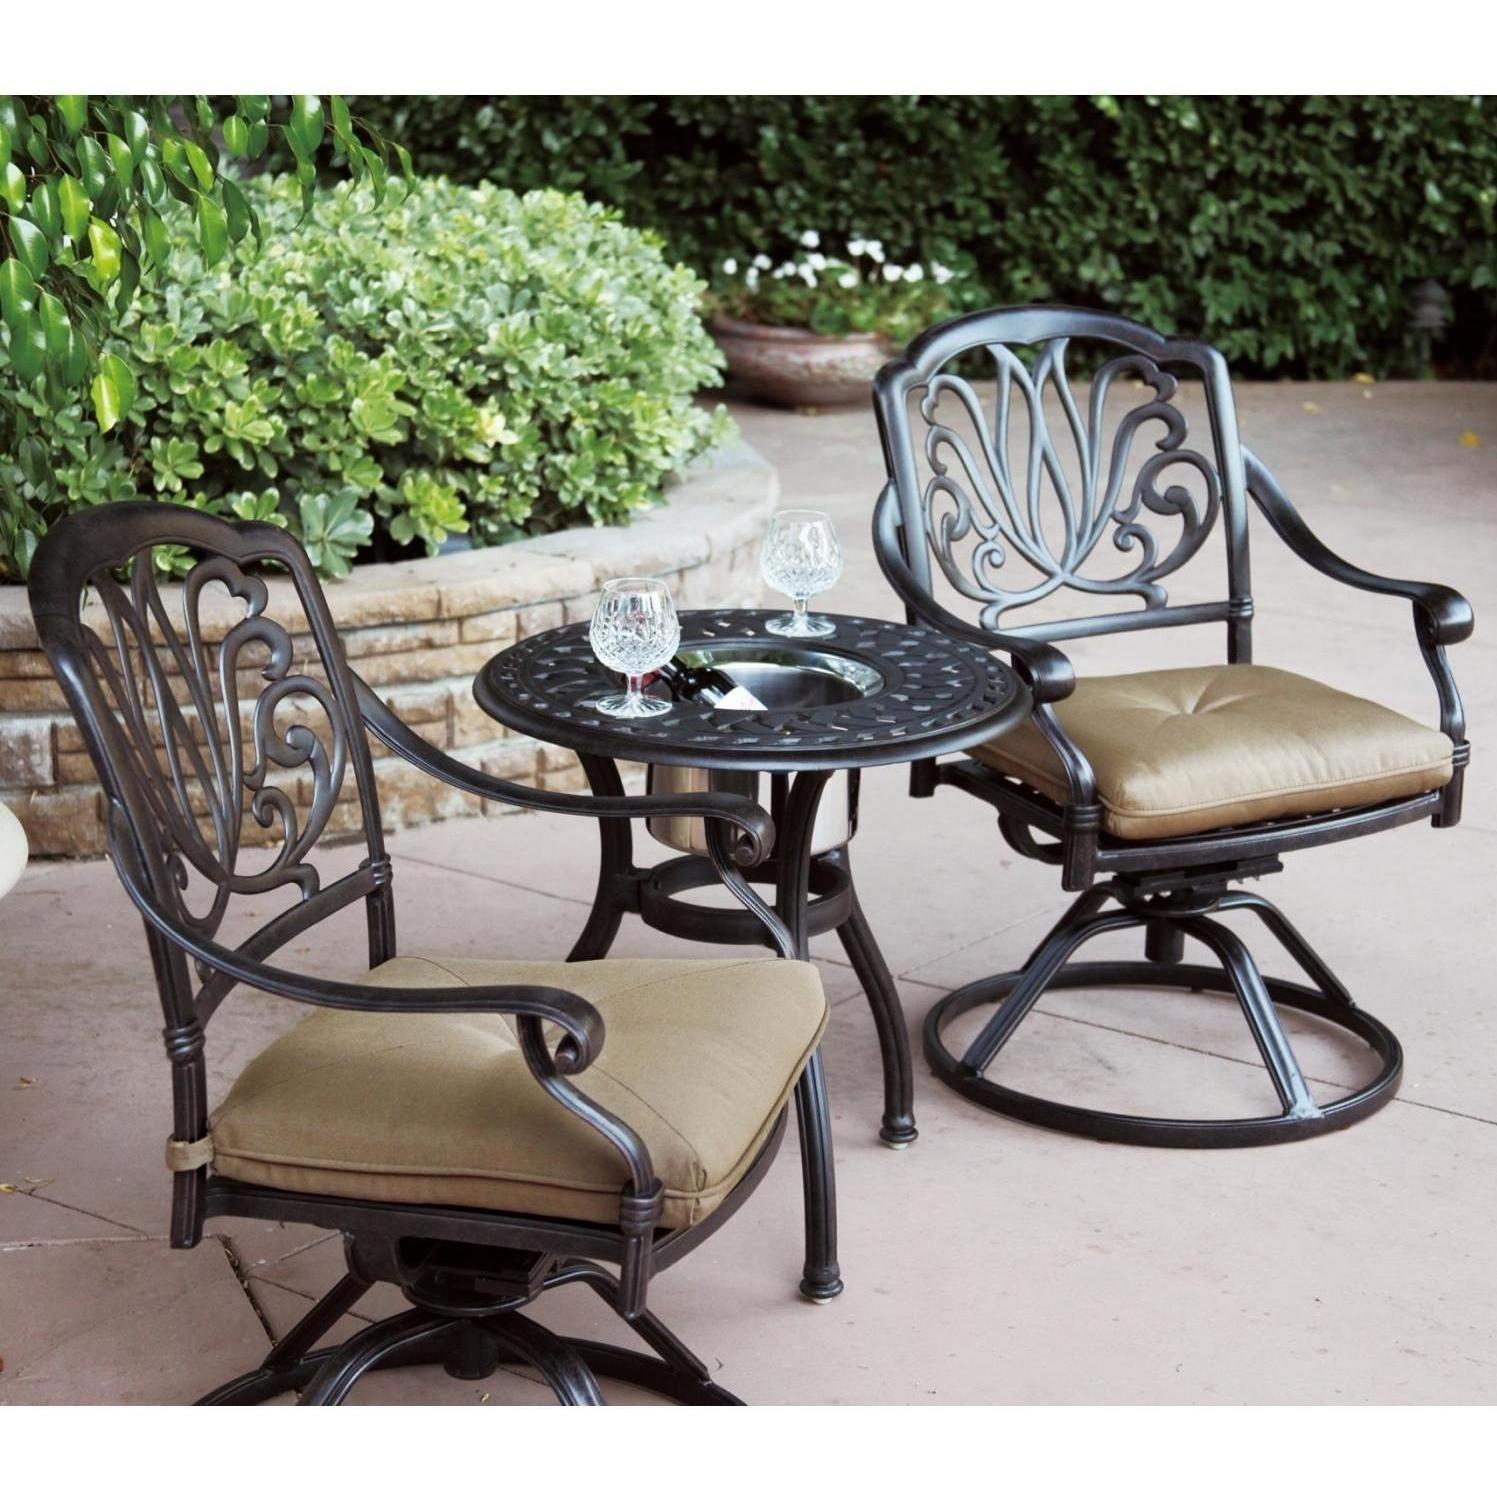 patio furniture bistro set cast aluminum swivel rocker 3pc lisse